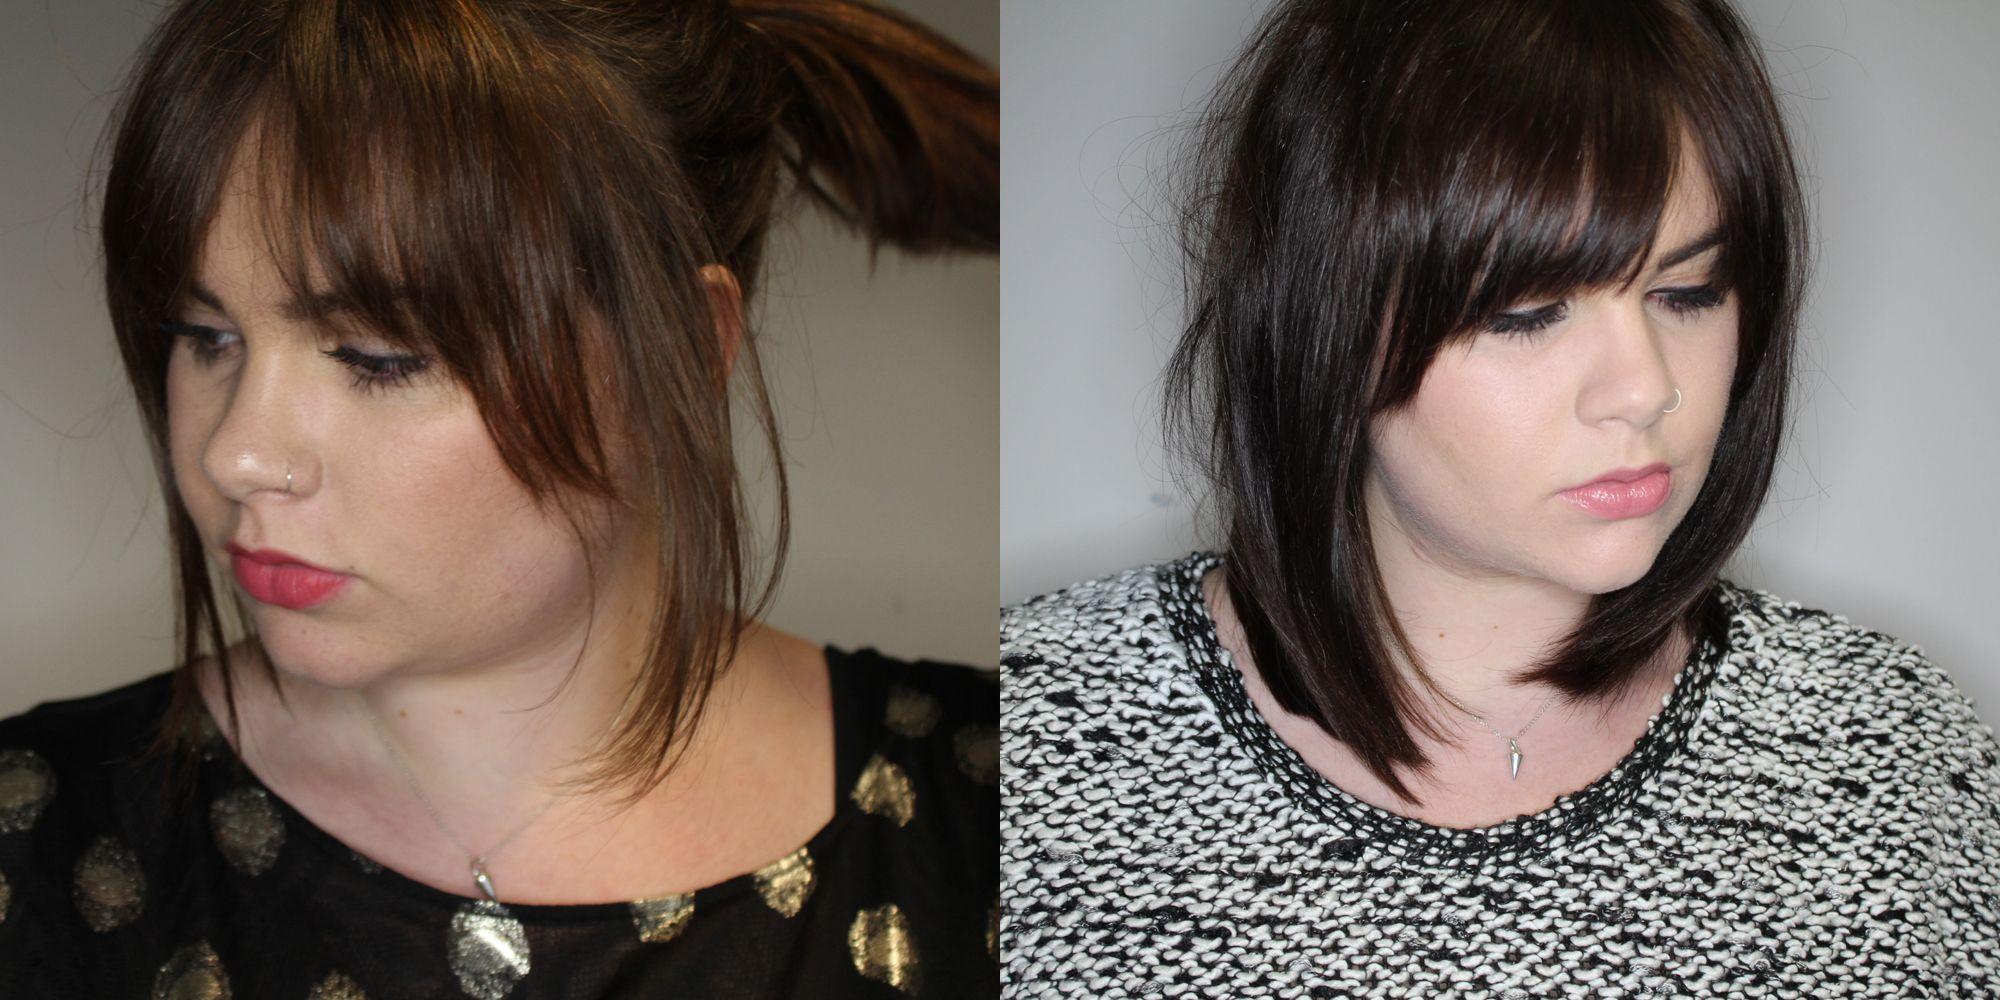 Reviewed: eSalon bespoke, at-home hair dye service